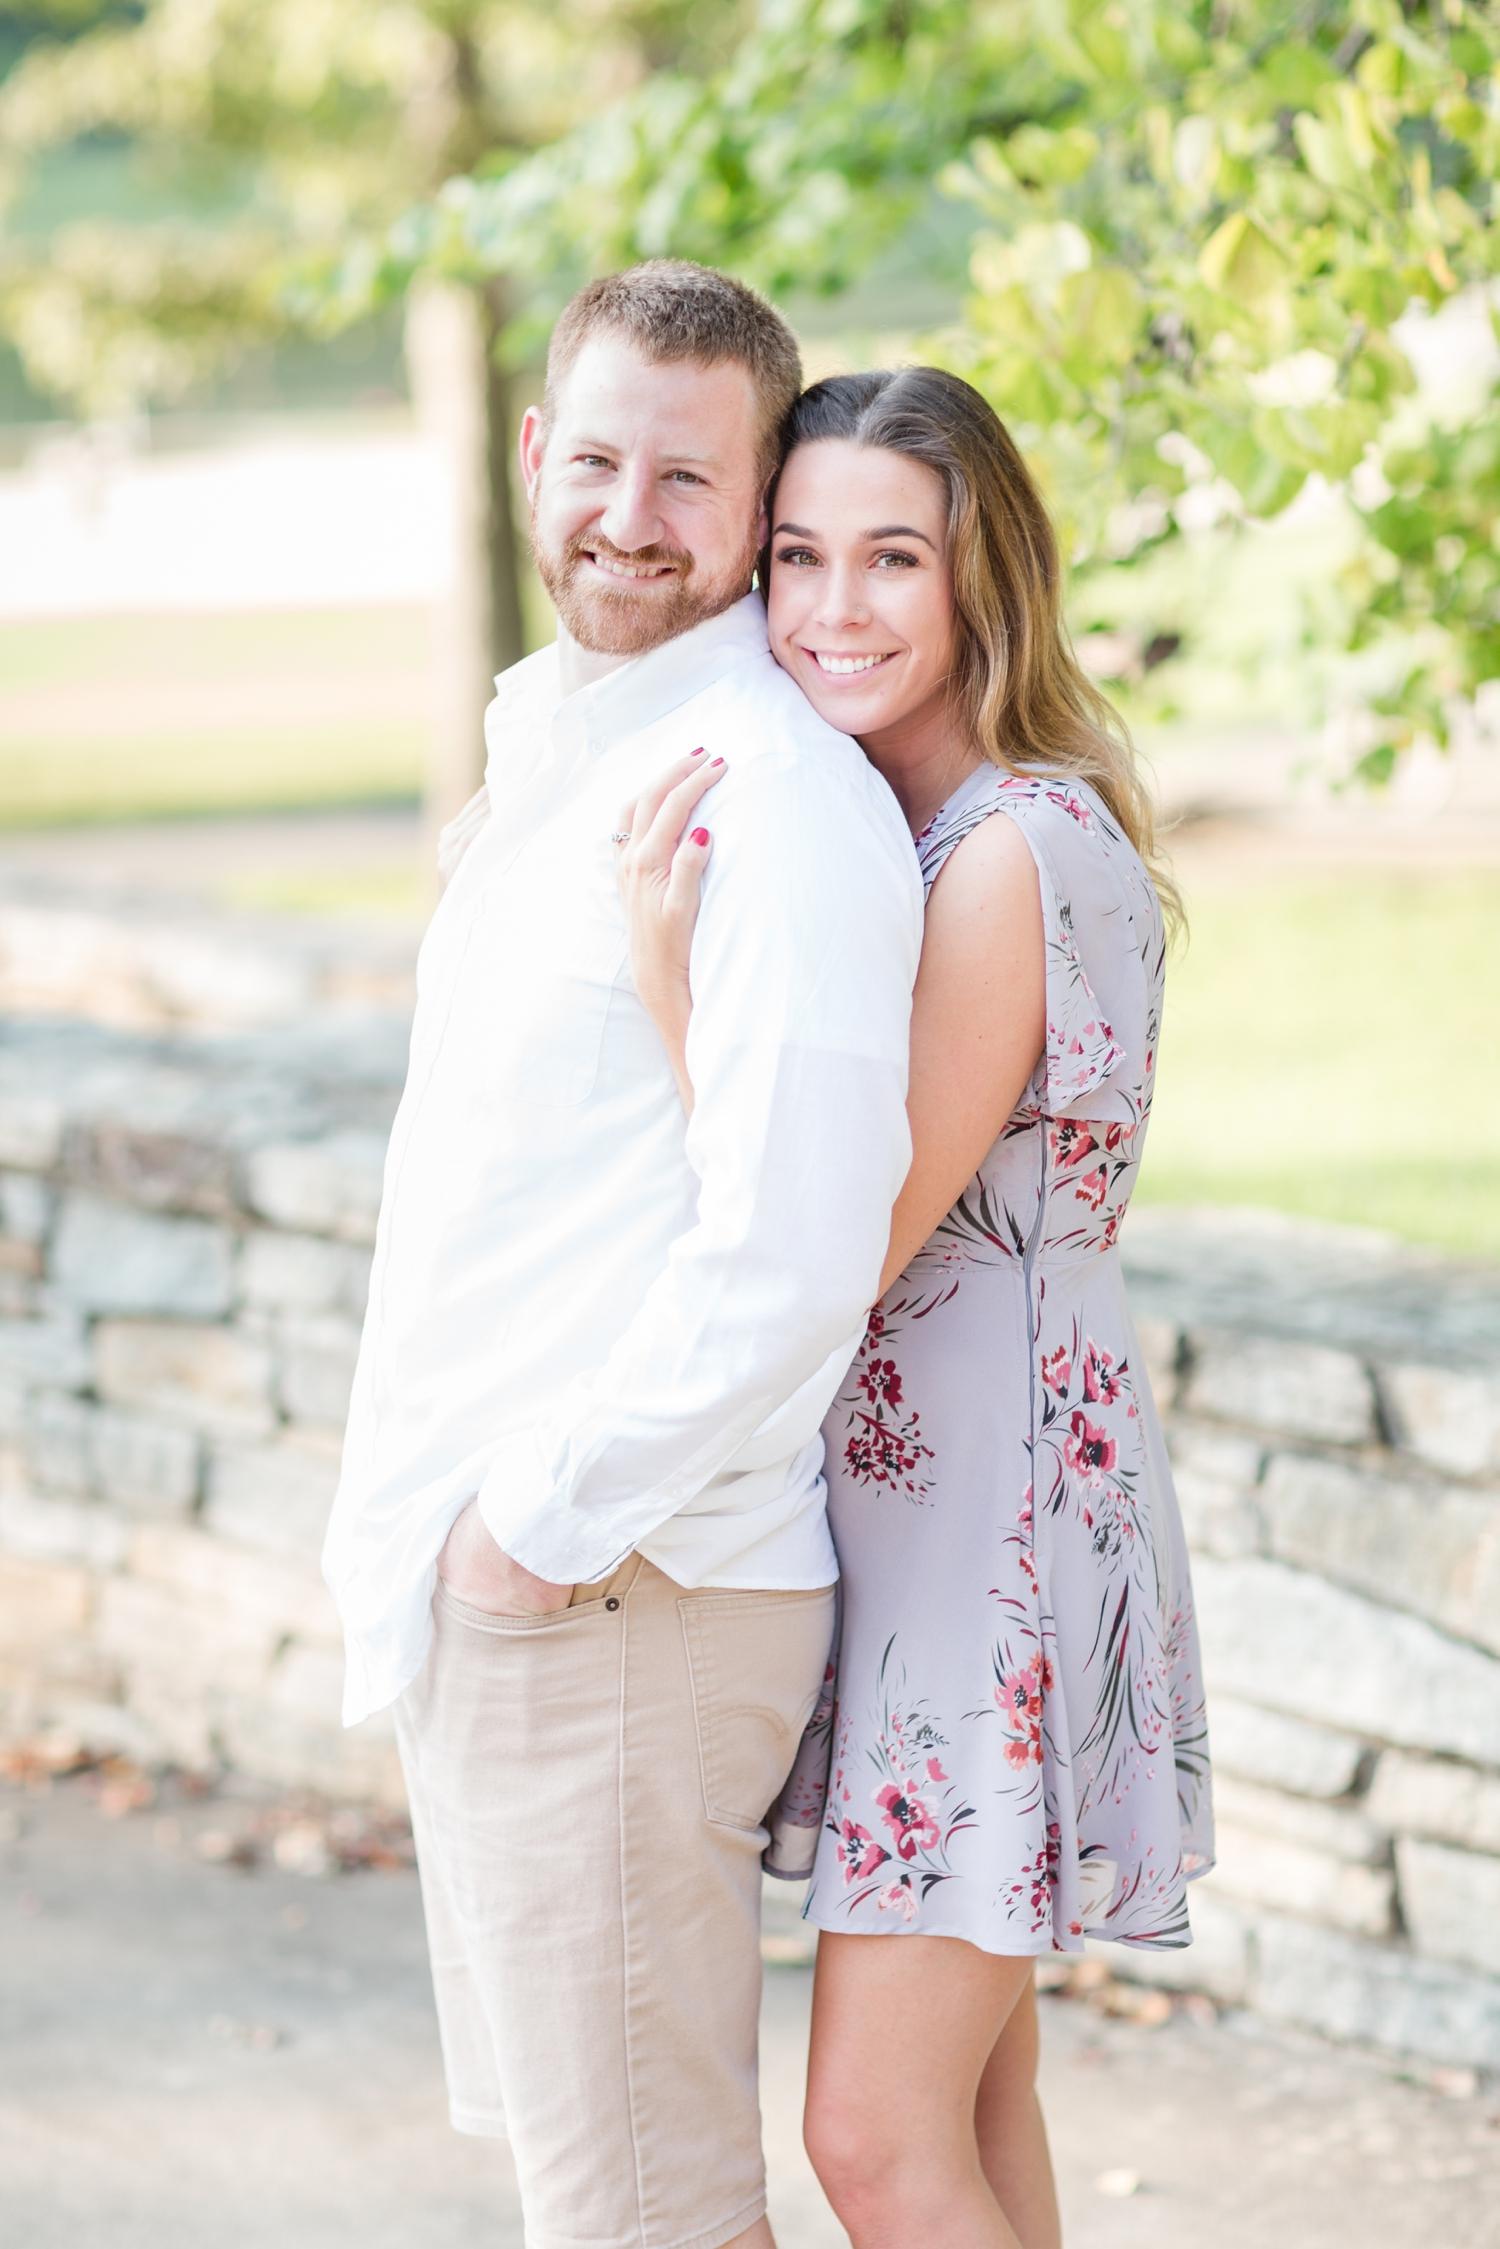 Elise & Shawn Engagement-84_Greenbrier-State-Park-Engagement-Maryland-engagement-wedding-photographer-anna-grace-photography-photo.jpg